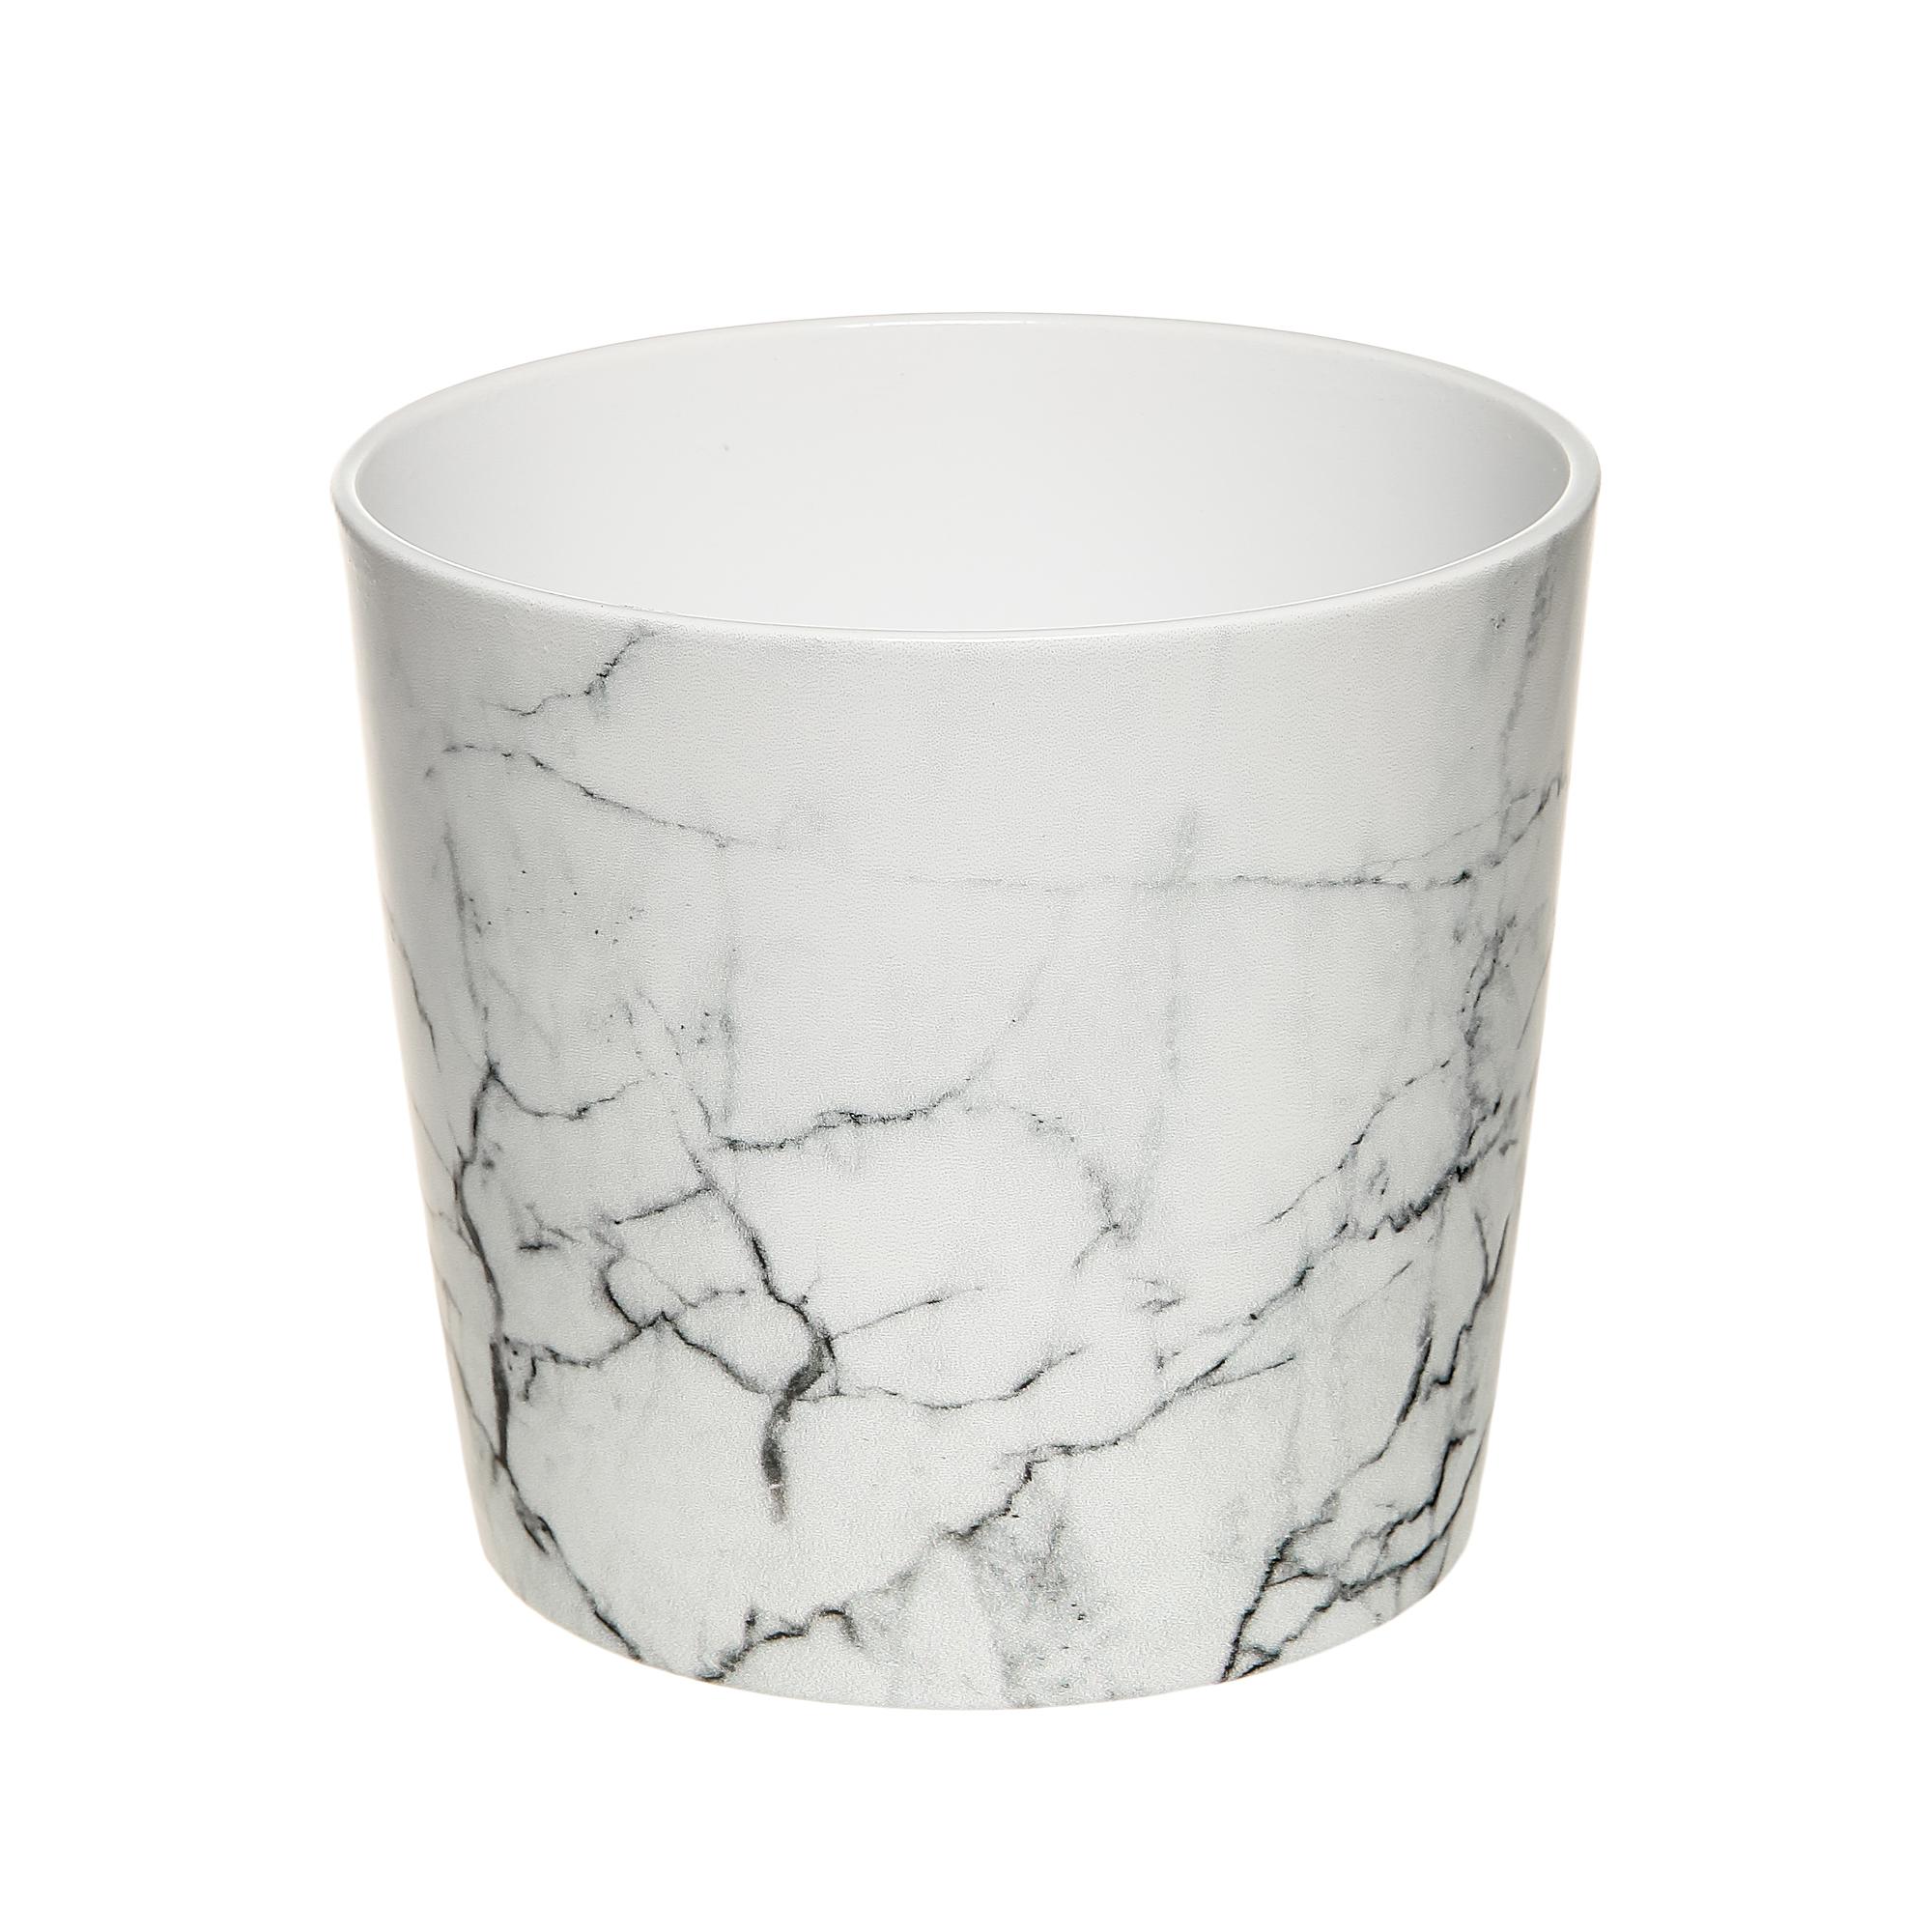 Кашпо Scheurich 870 cool marble 18 см фото